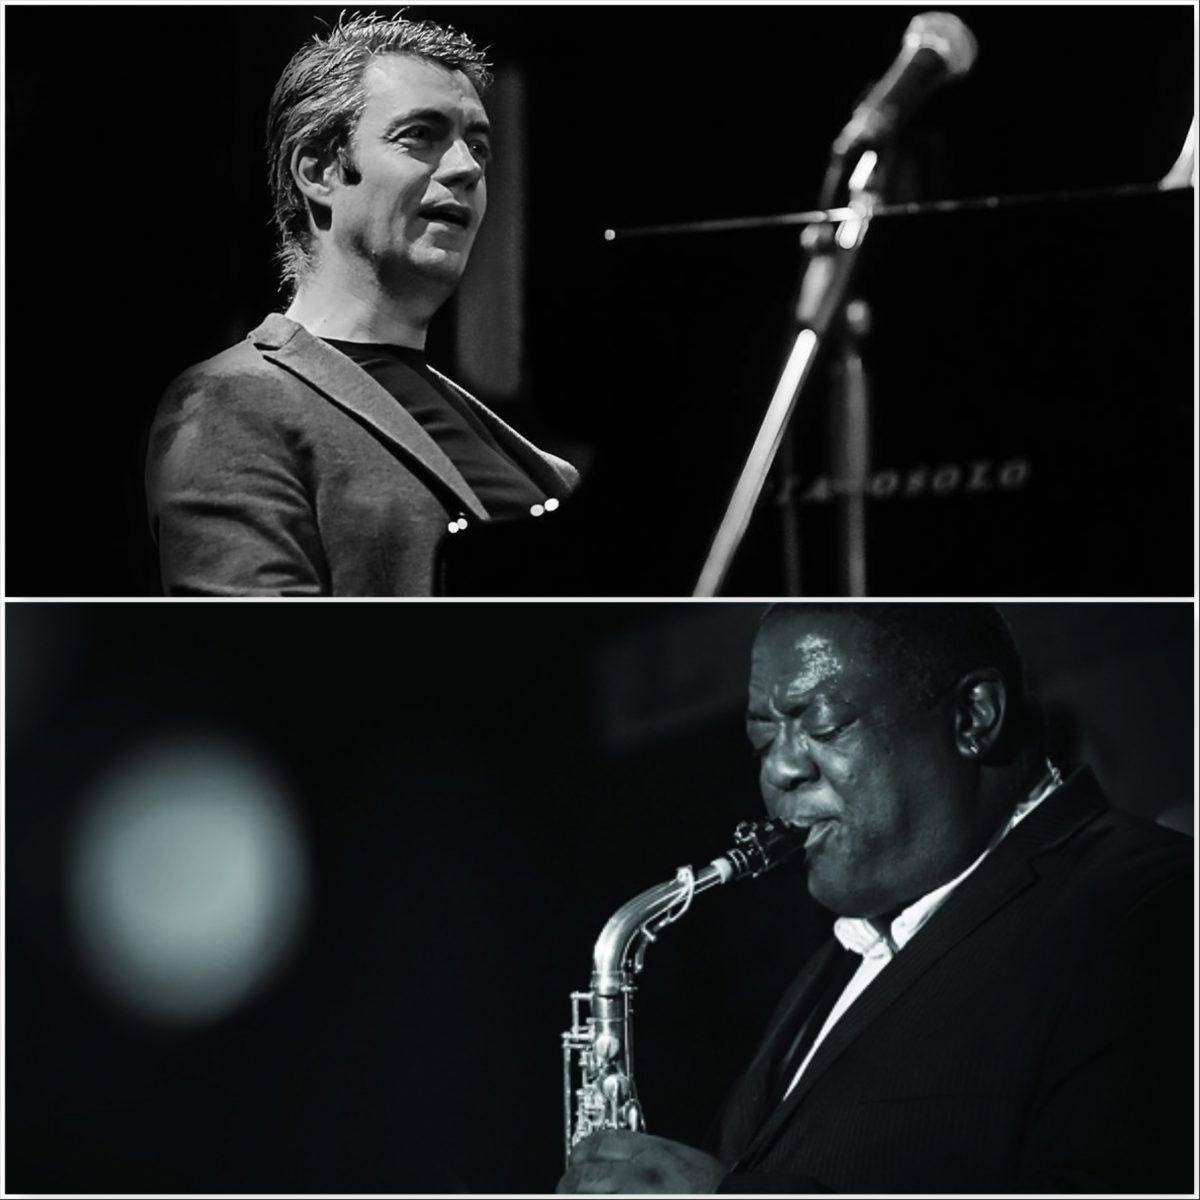 Andrea Pozza Trio special guest Jesse Davis Martedì 9 genn. 2018 ore 22 Cantine de L'Arena Verona